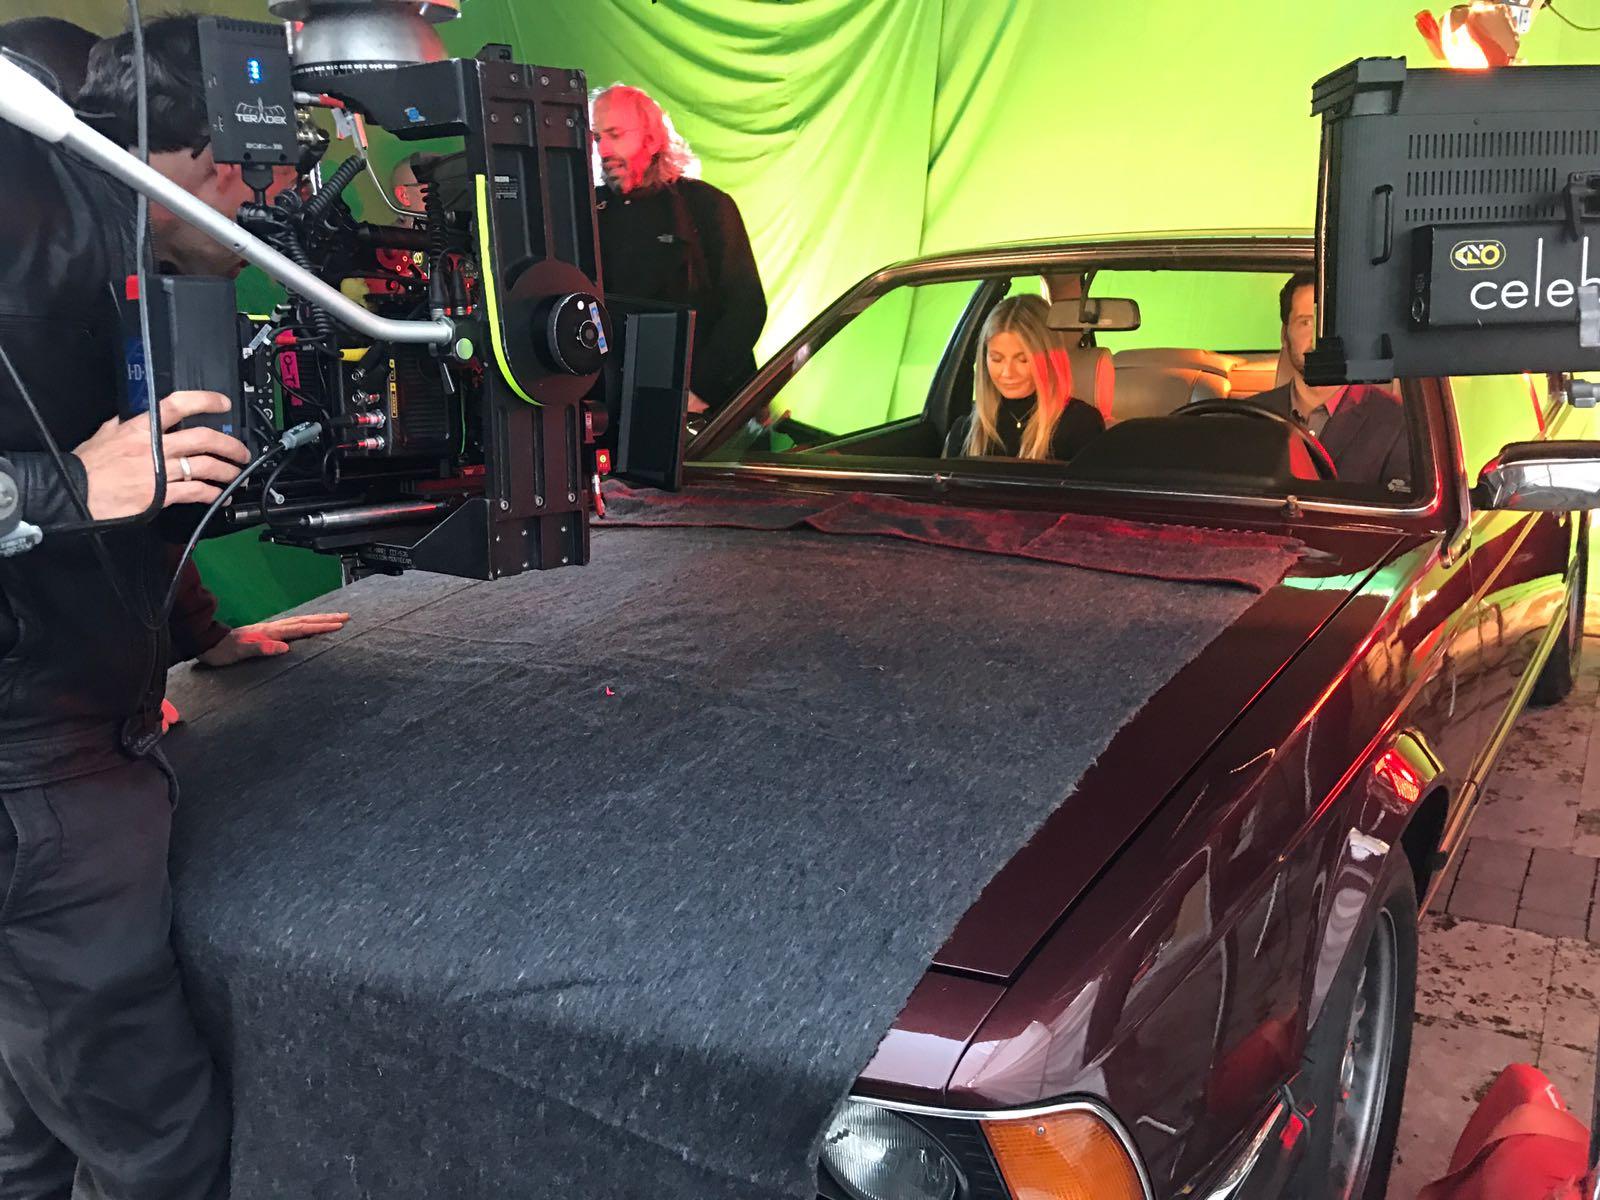 anuncio tous con gwyneth paltrow vehiculo de escena making of tyreaction bmw 2